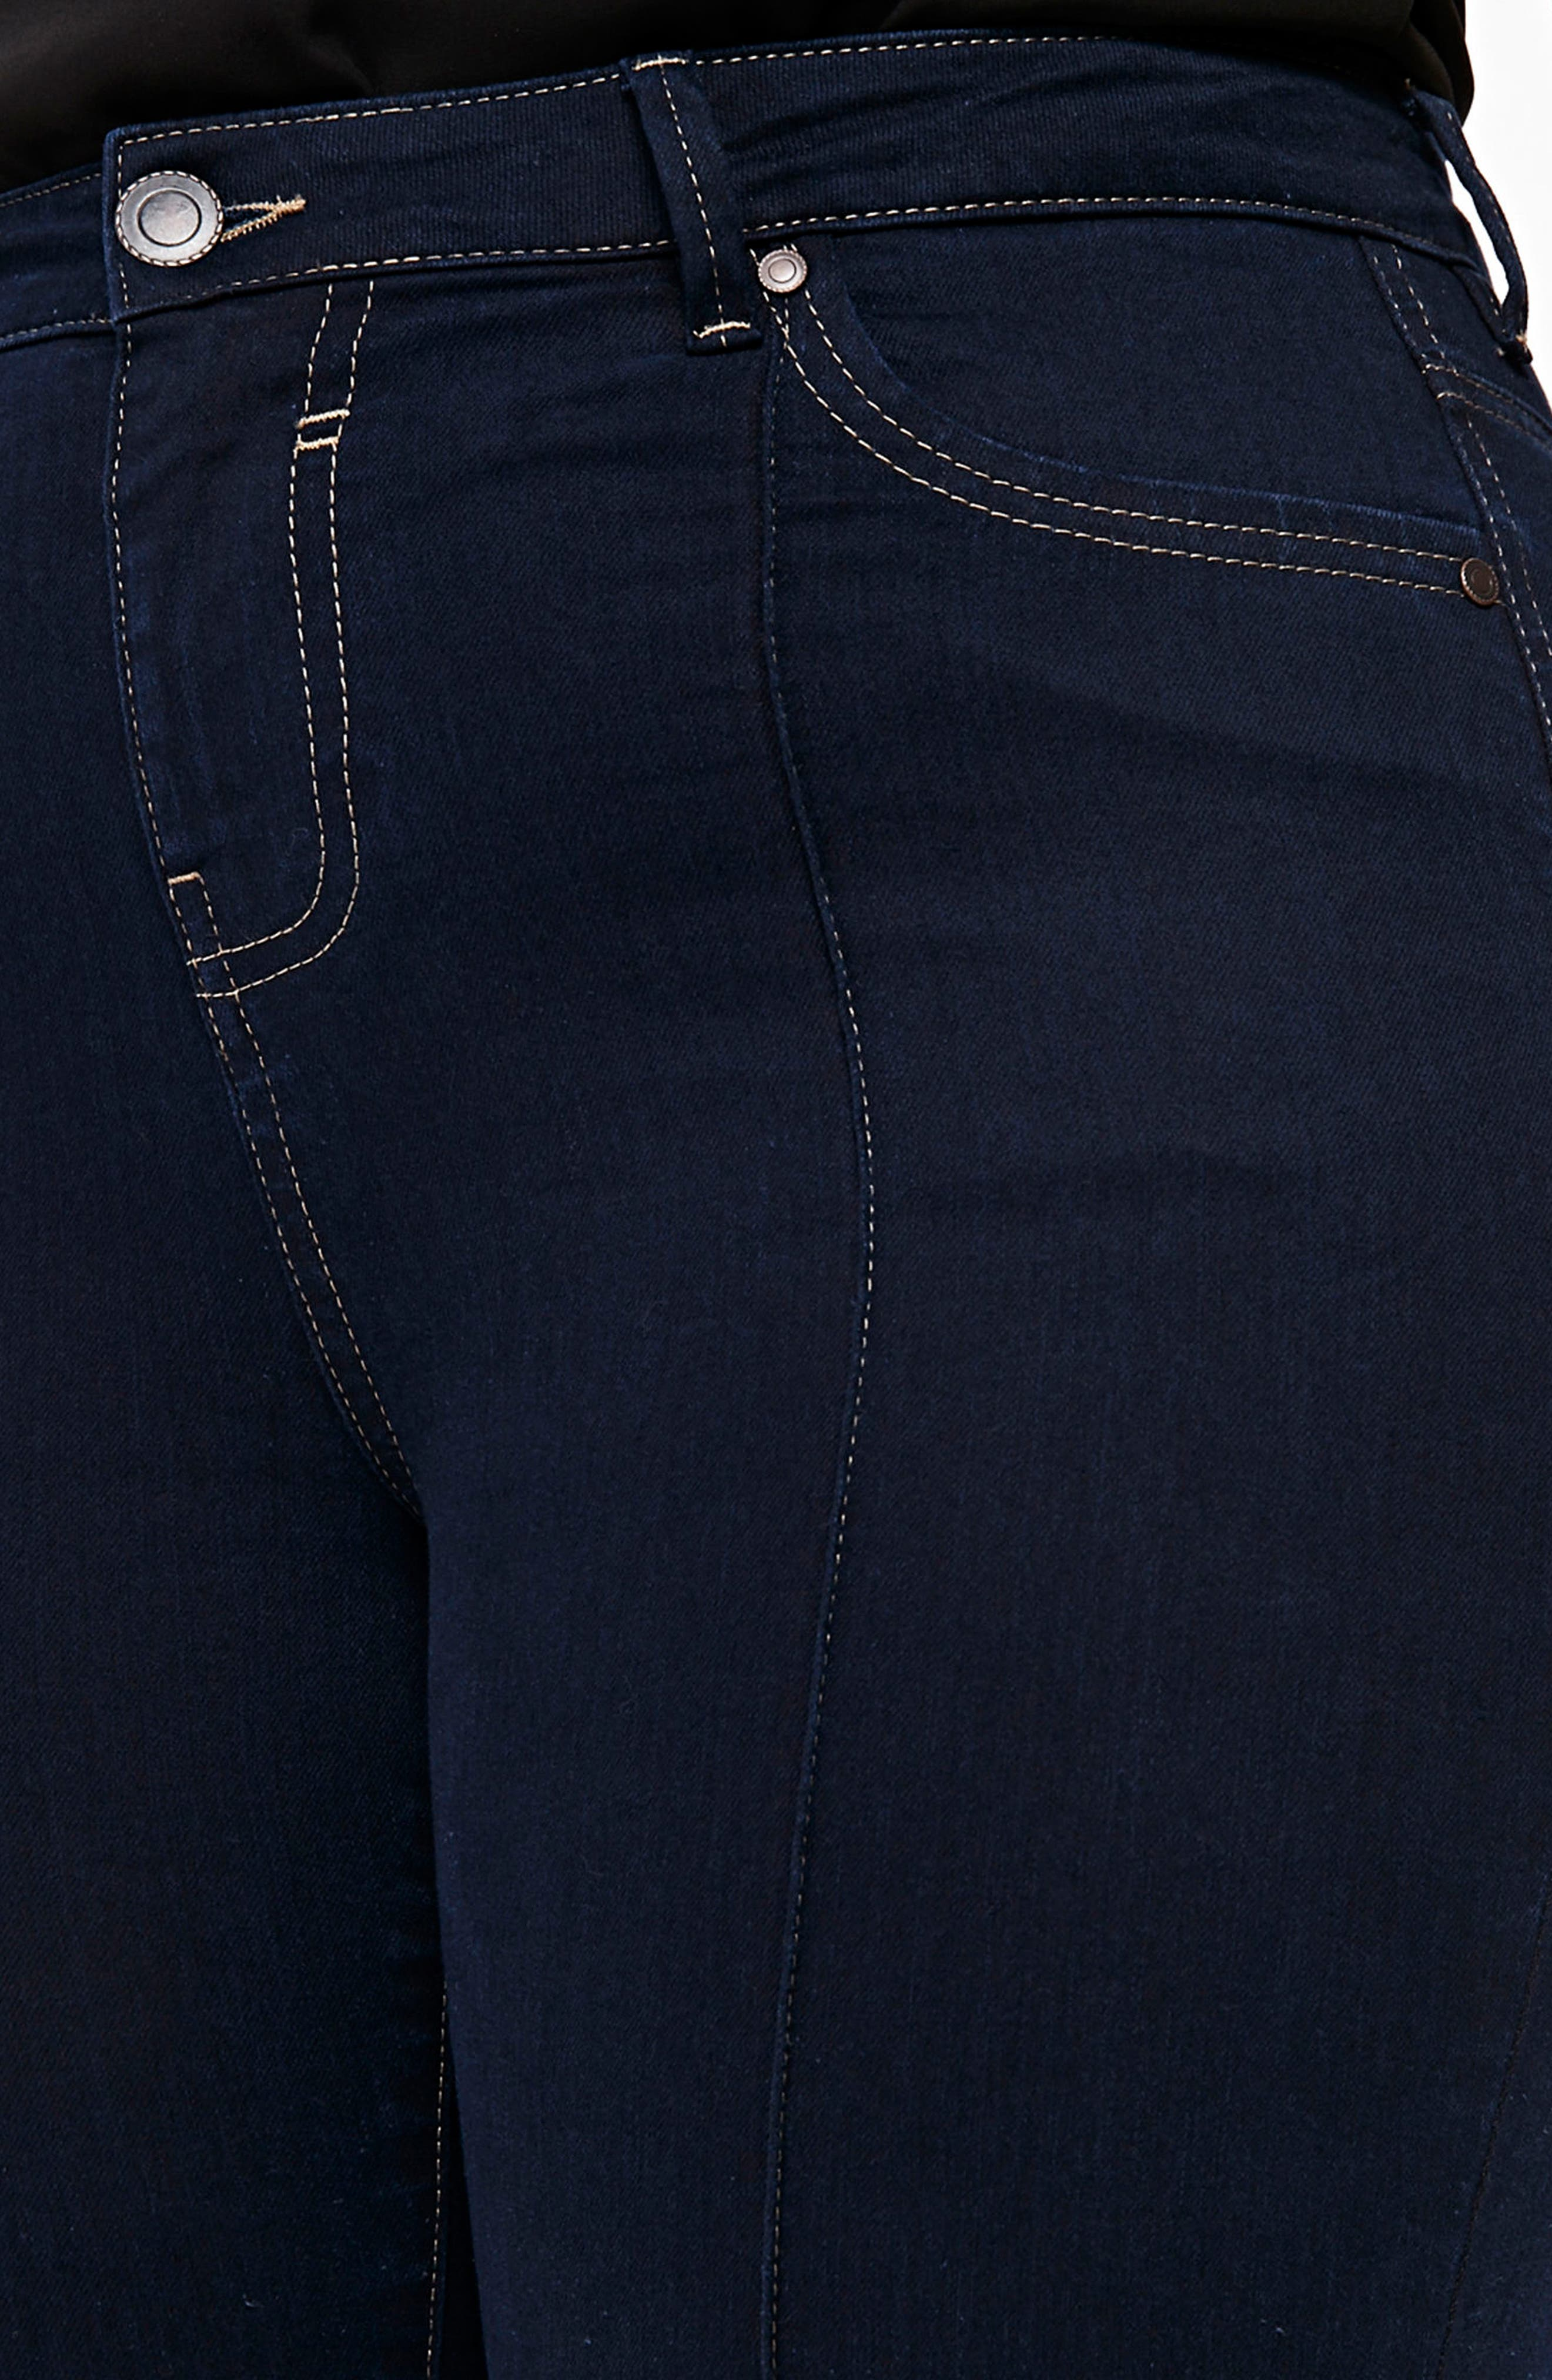 Pintuck High Waist Skinny Jeans,                             Alternate thumbnail 4, color,                             Indigo